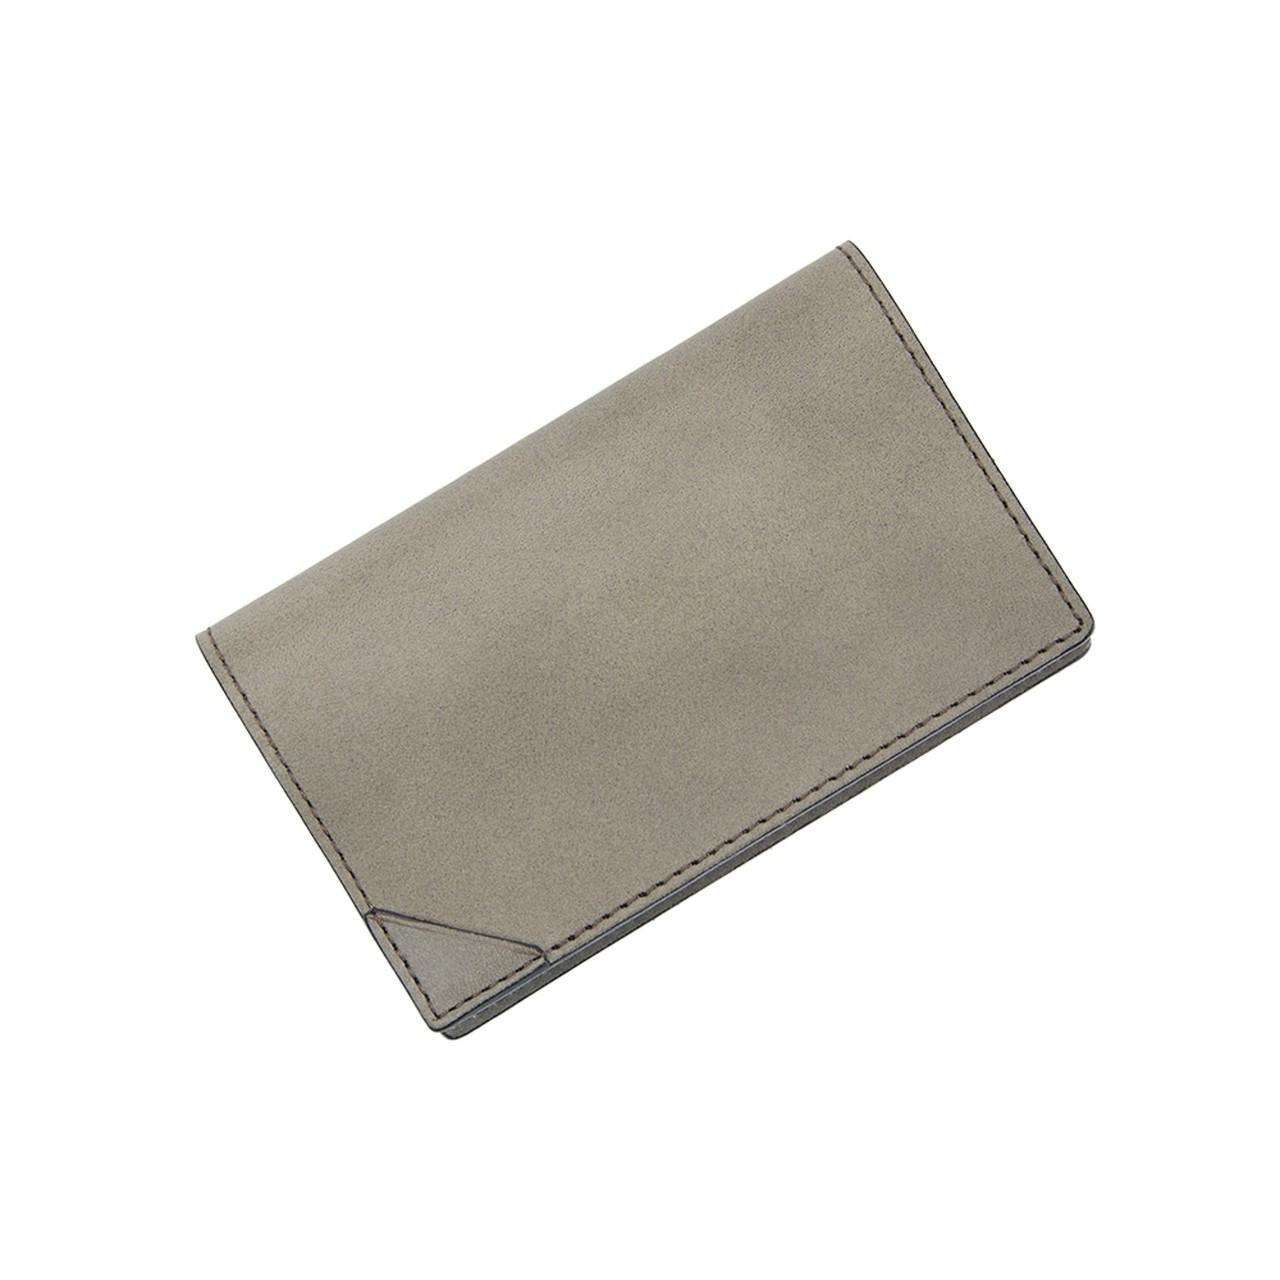 FLAT CARD CASE GRAY